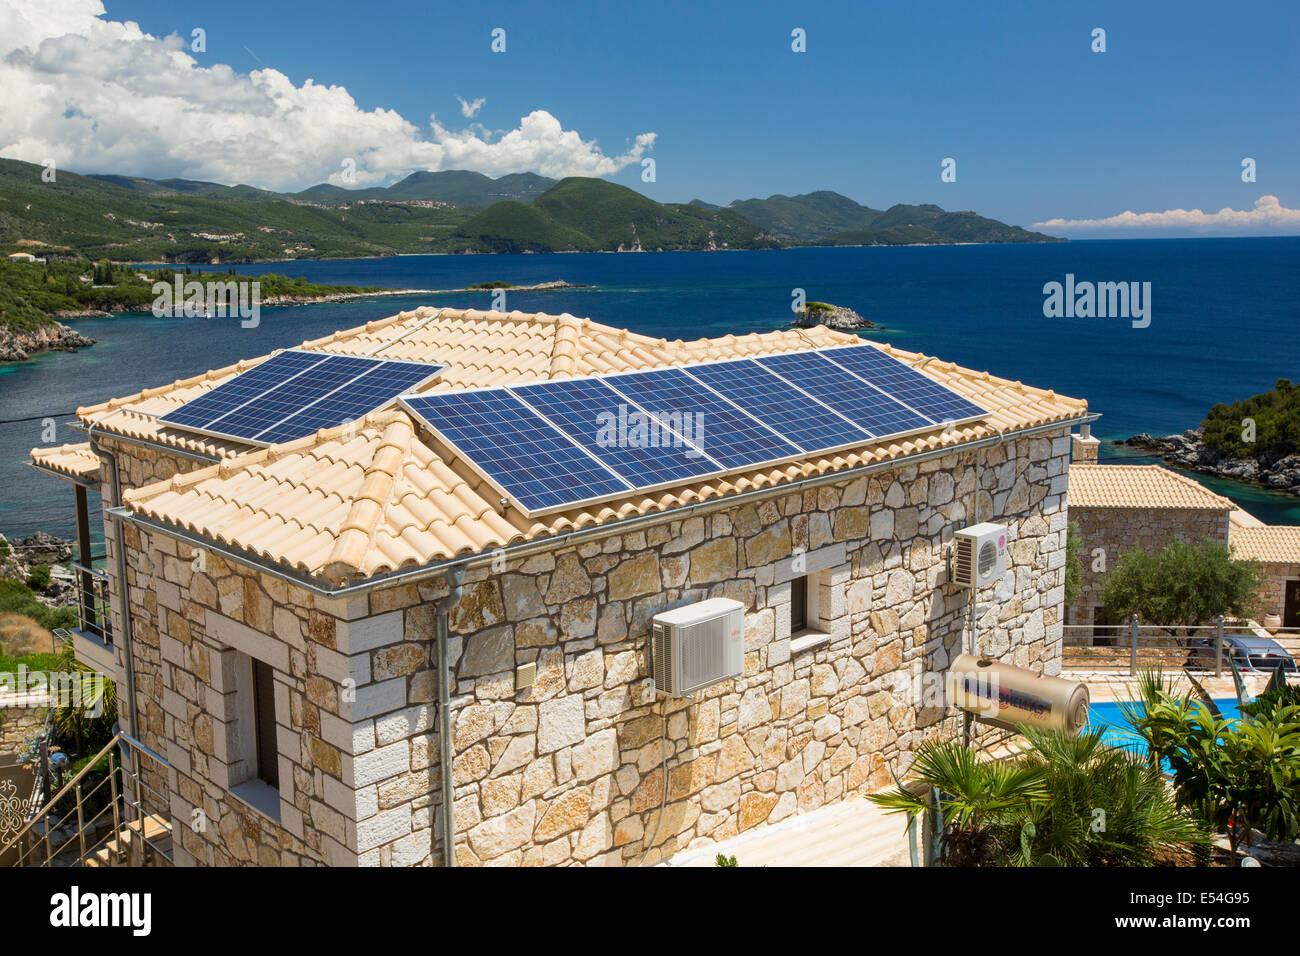 Solar Panels On House In Sivota Greece Stock Photo